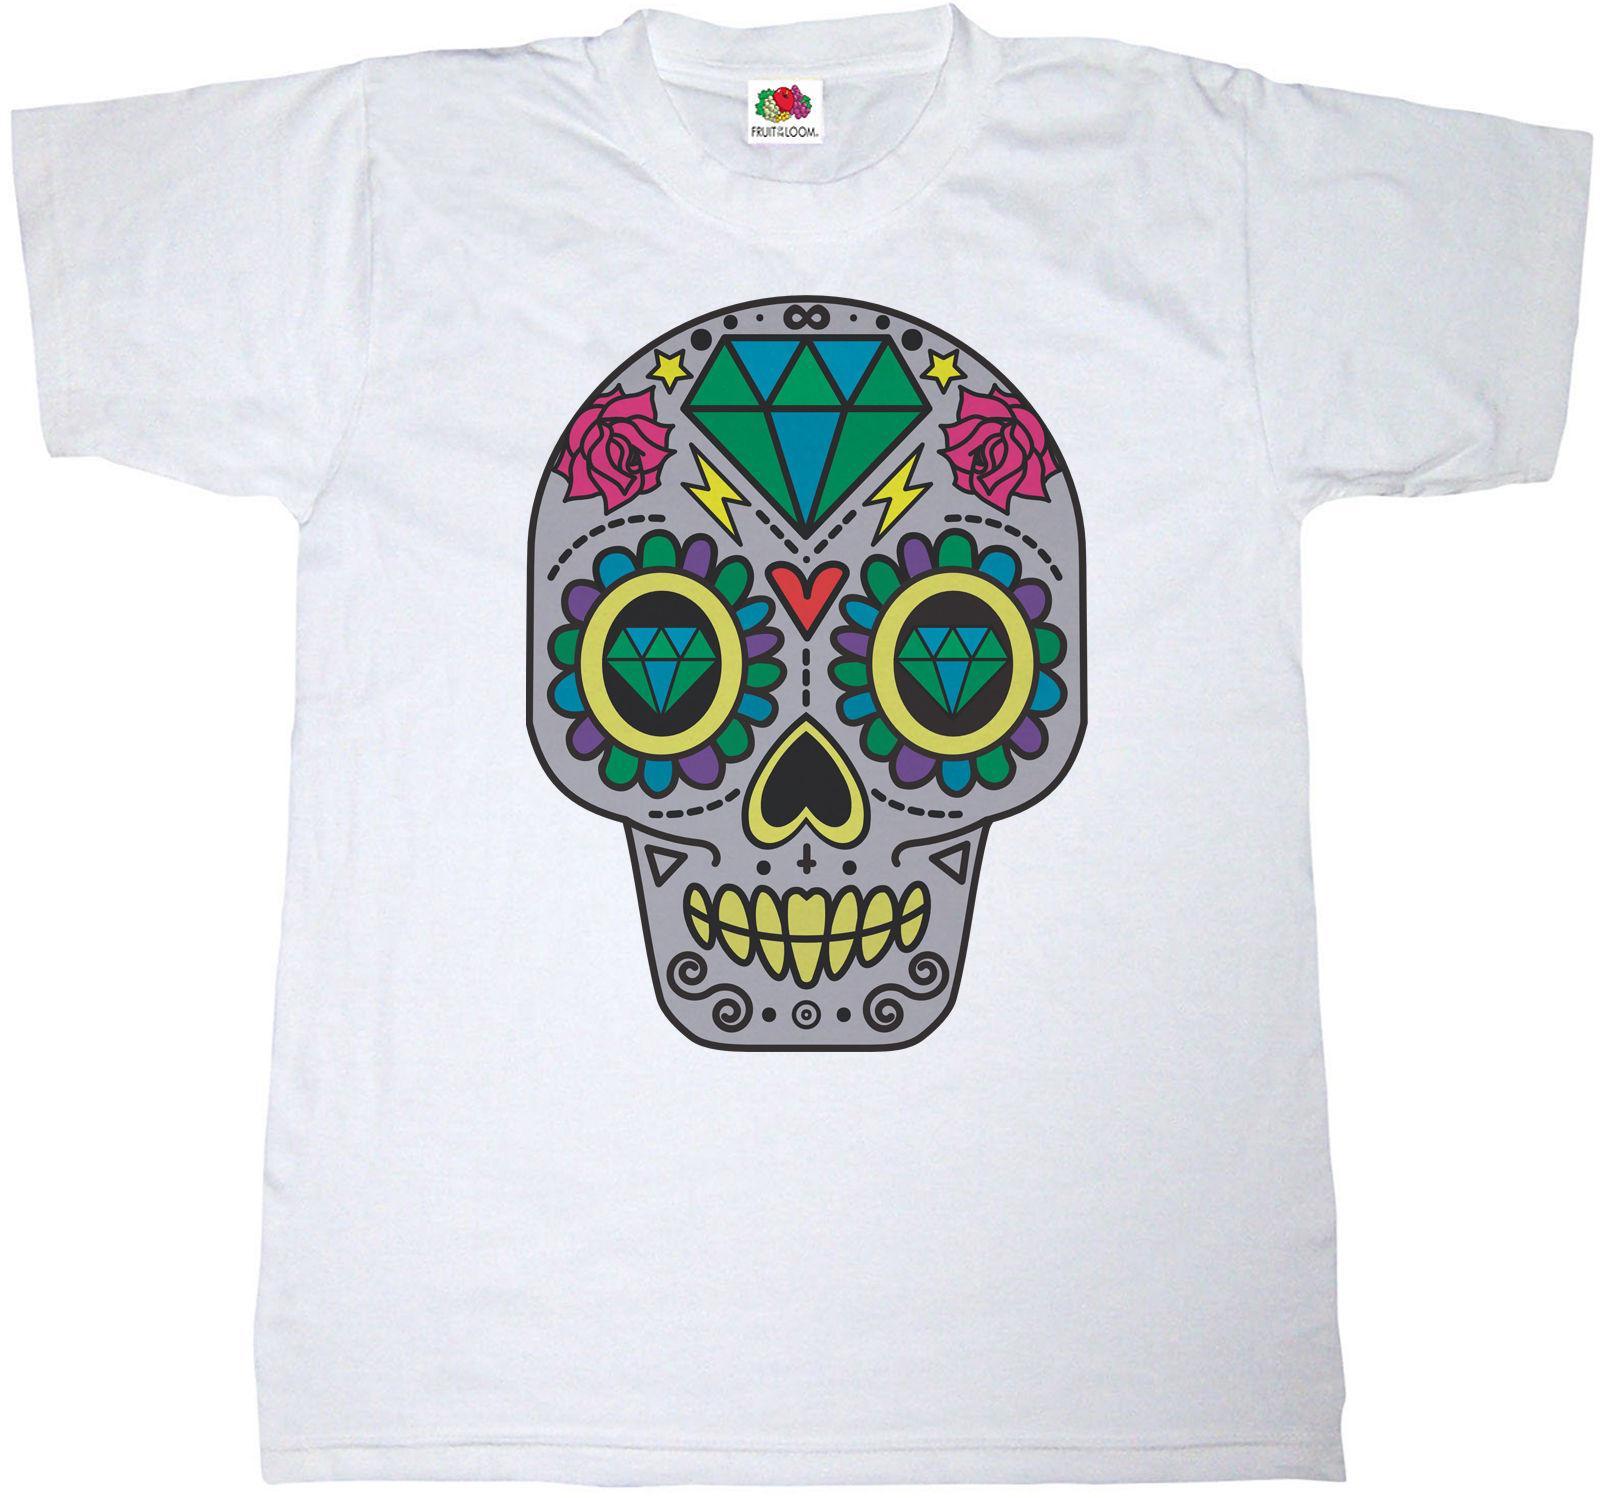 bf7cf547 SUGAR SKULL T SHIRT 100% COTTON CANDY MEXICO MEXICAN SKELETON HEART T SHIRT  FUN Ot Shirts Best Designer T Shirts From Beidhgate07, $11.01  DHgate.Com